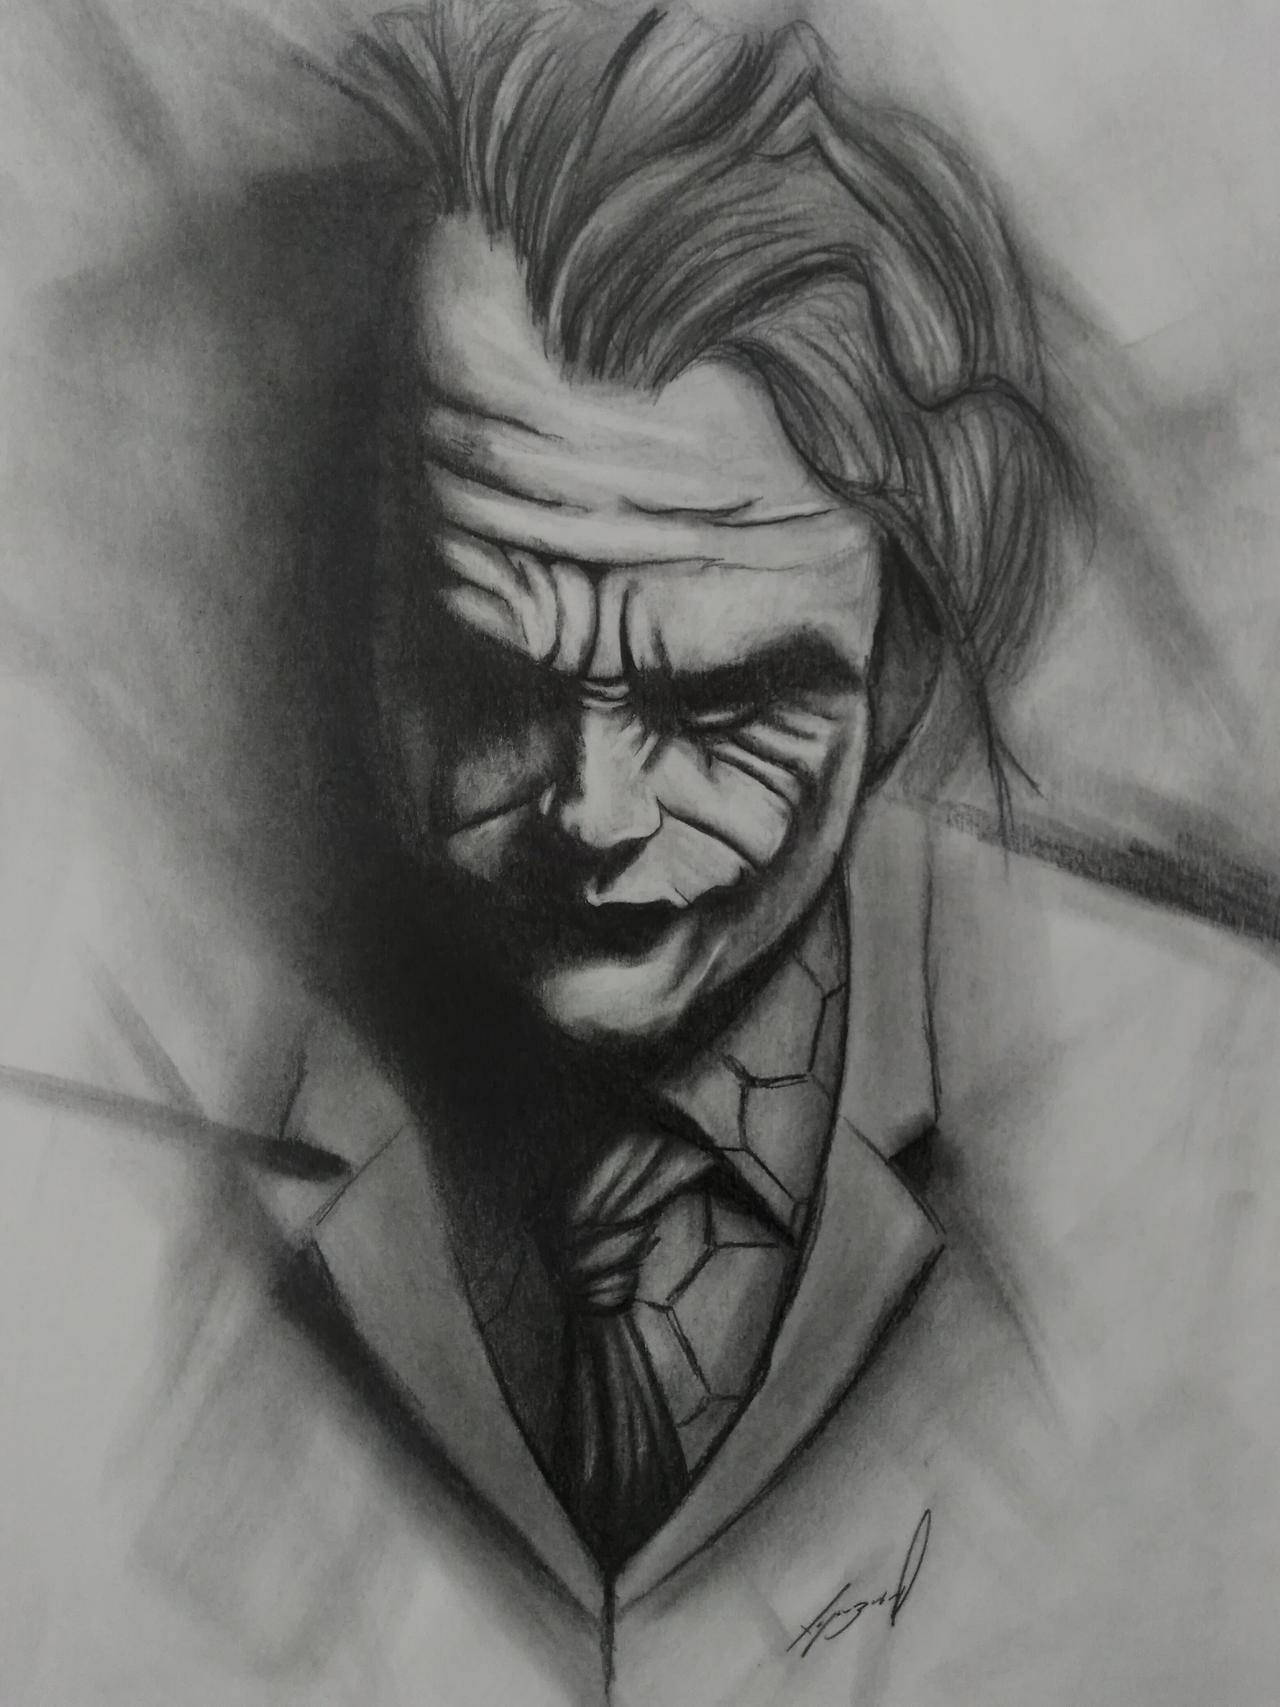 The Joker Pencil Drawing By Morkedin On Deviantart